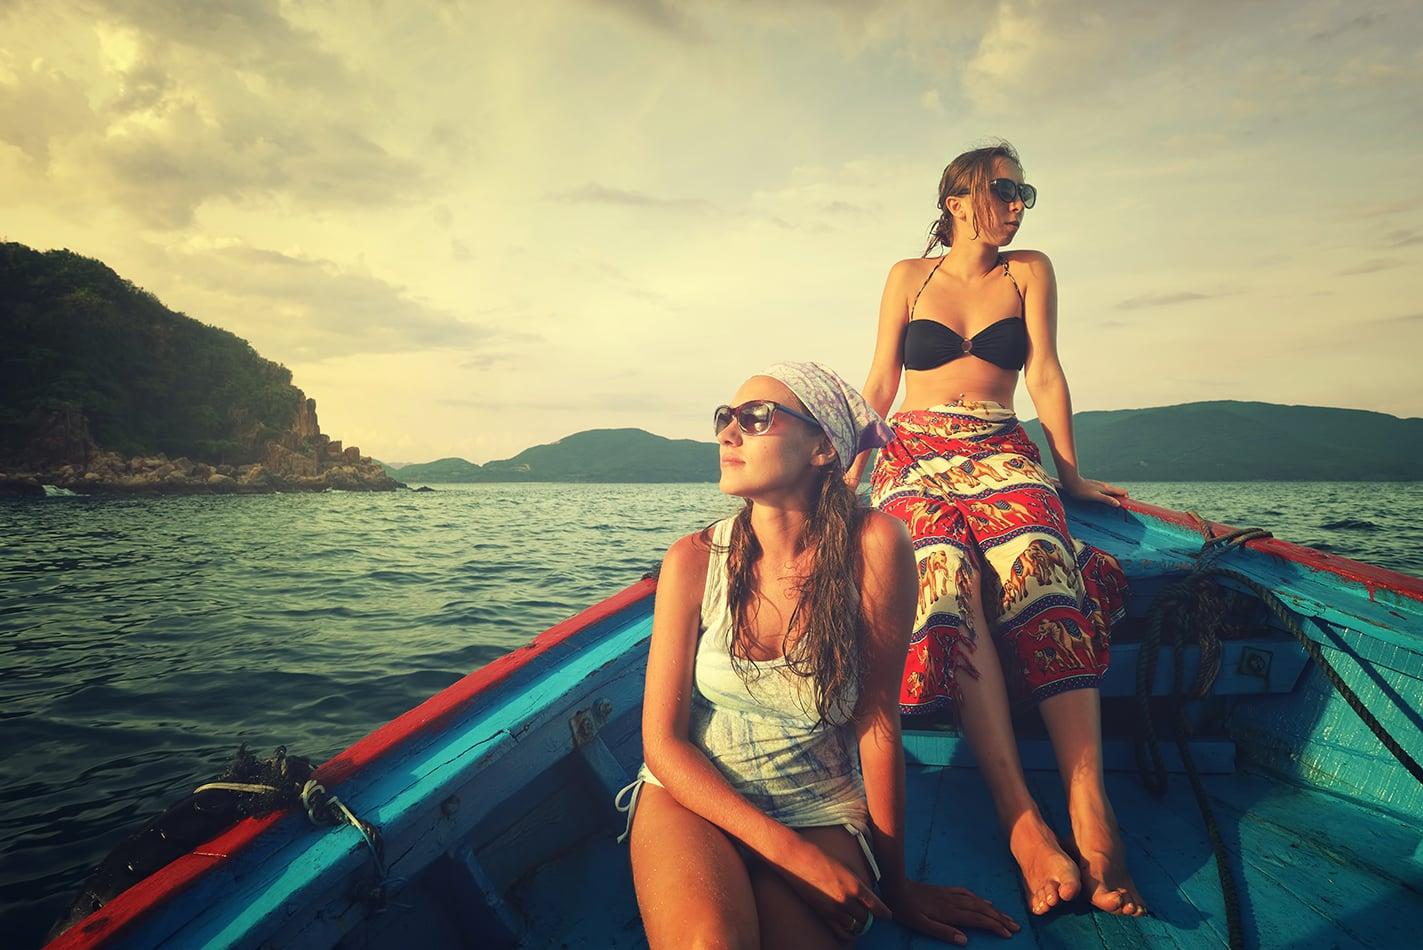 boat trip activities cyprus ayia napa protaras troodos limassol nicosia pahos luxcy services